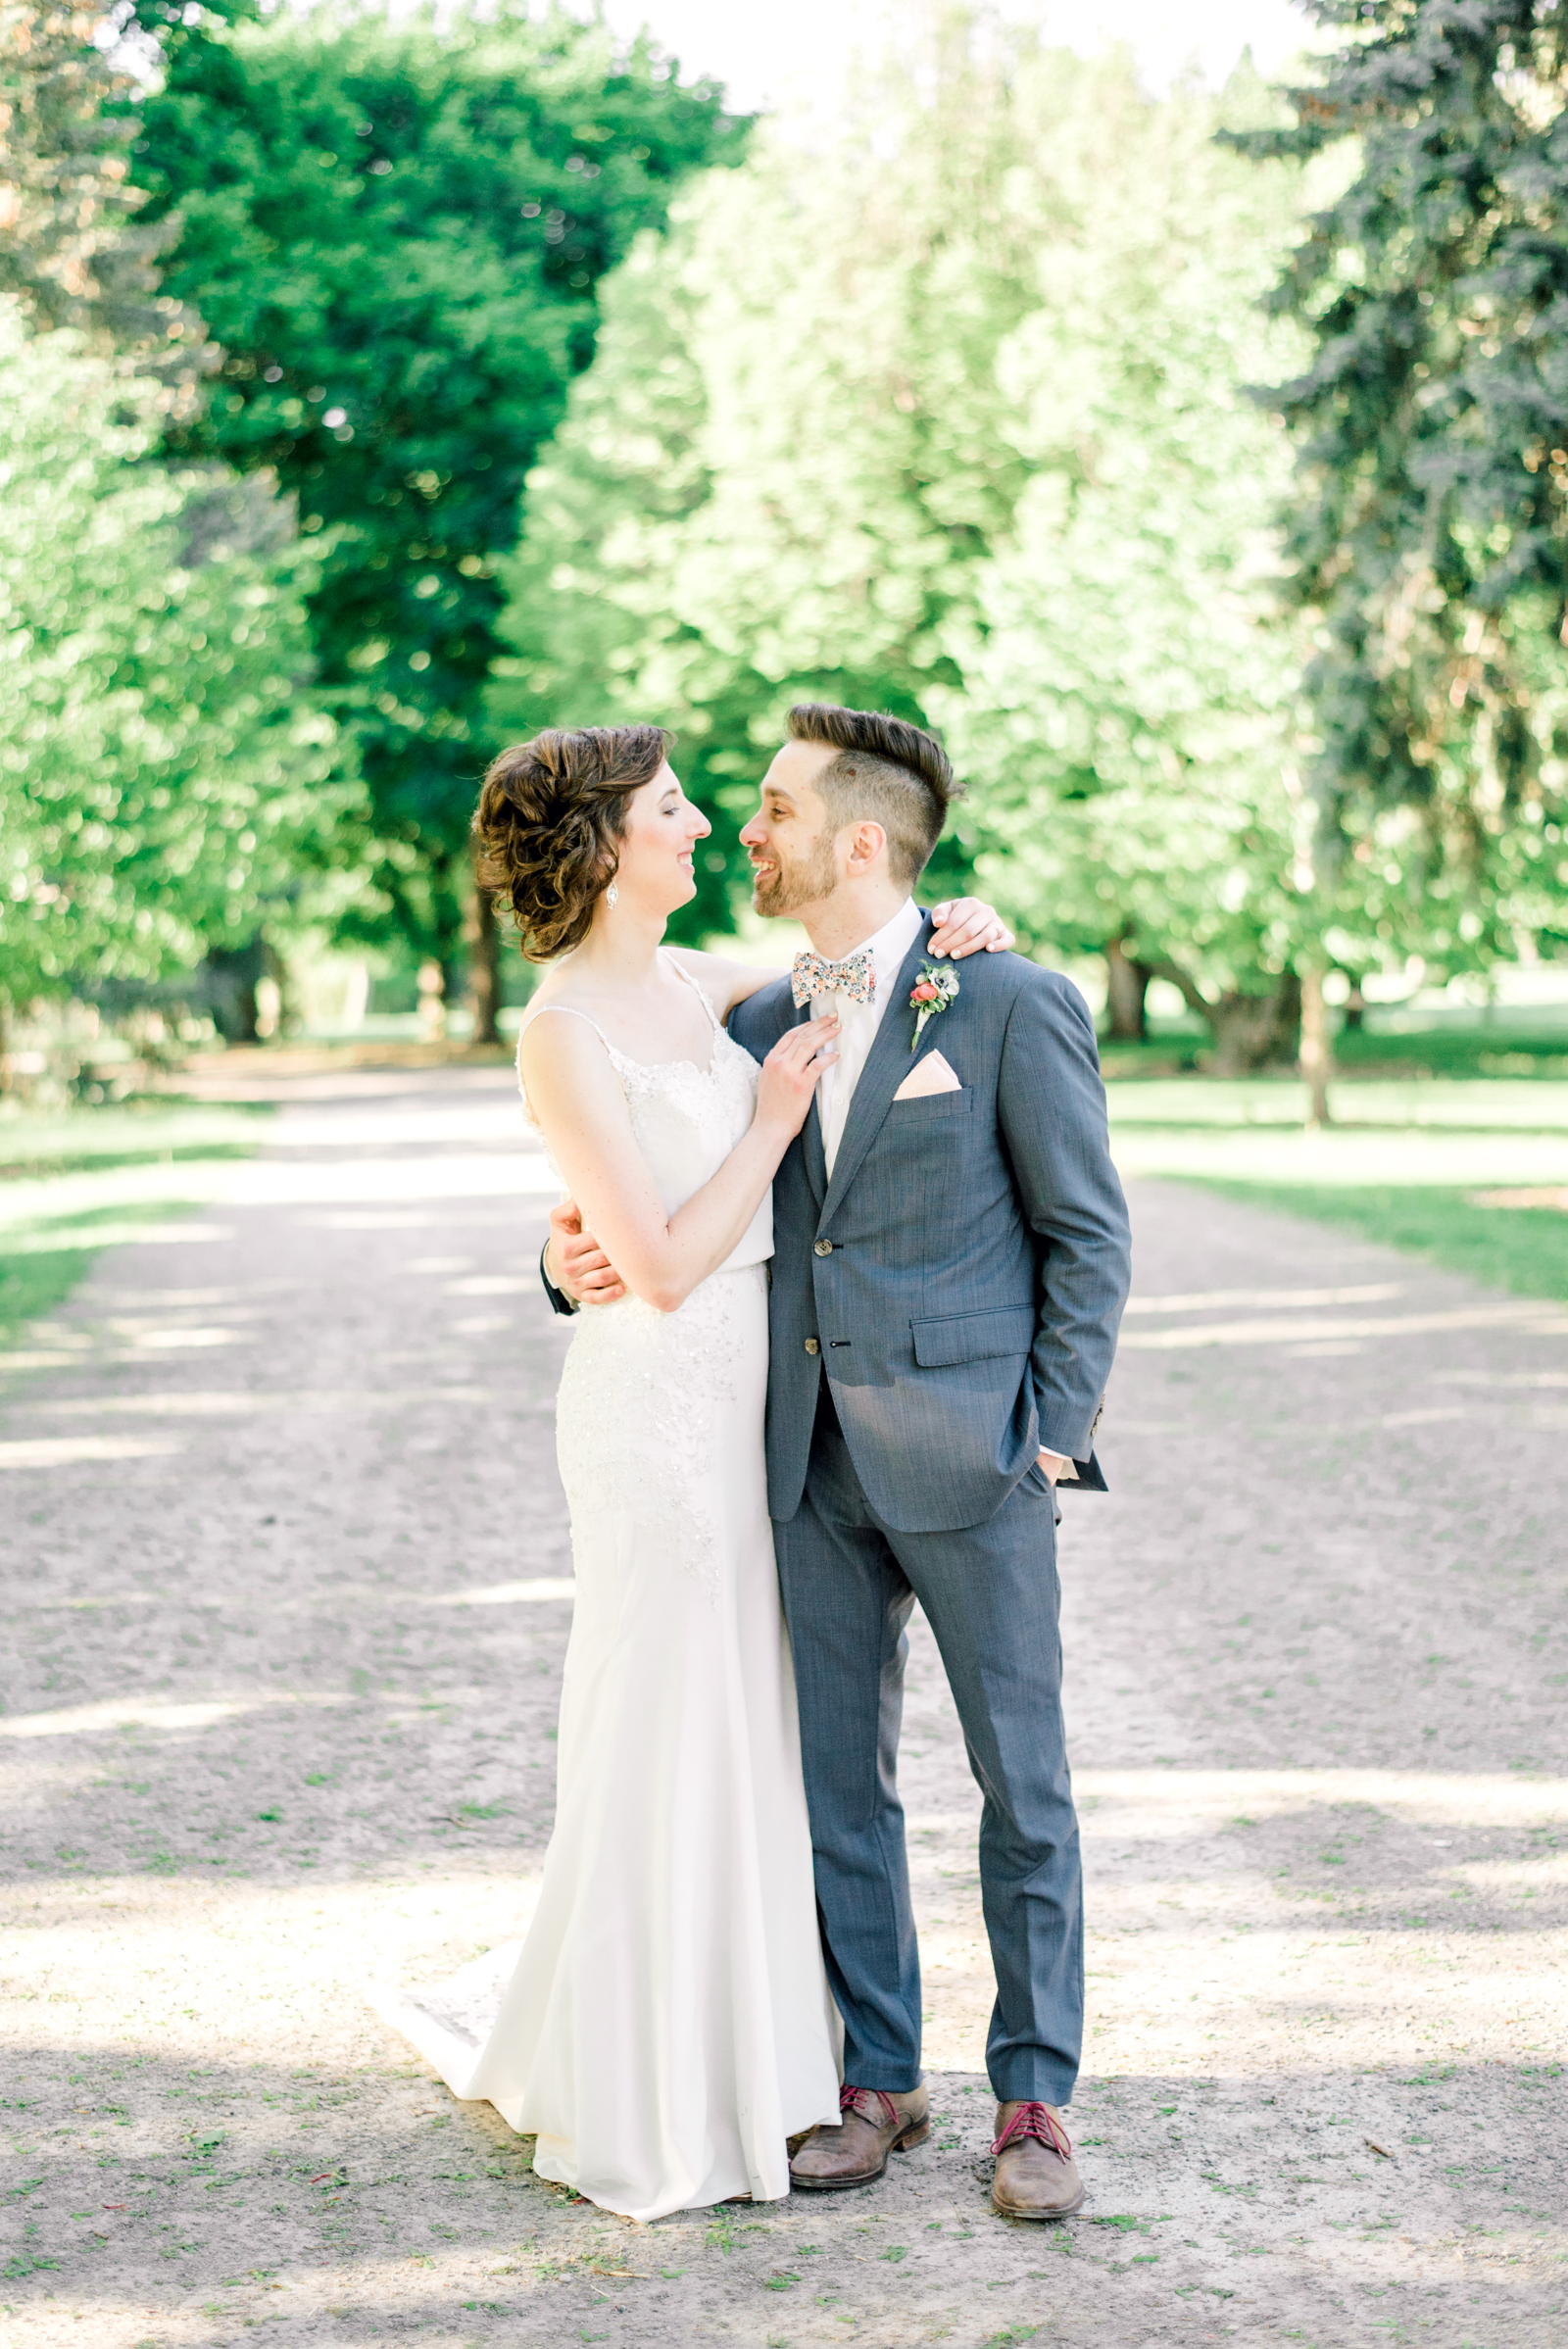 Meghan & Ben - Hamilton Gage Park Wedding -16.jpg